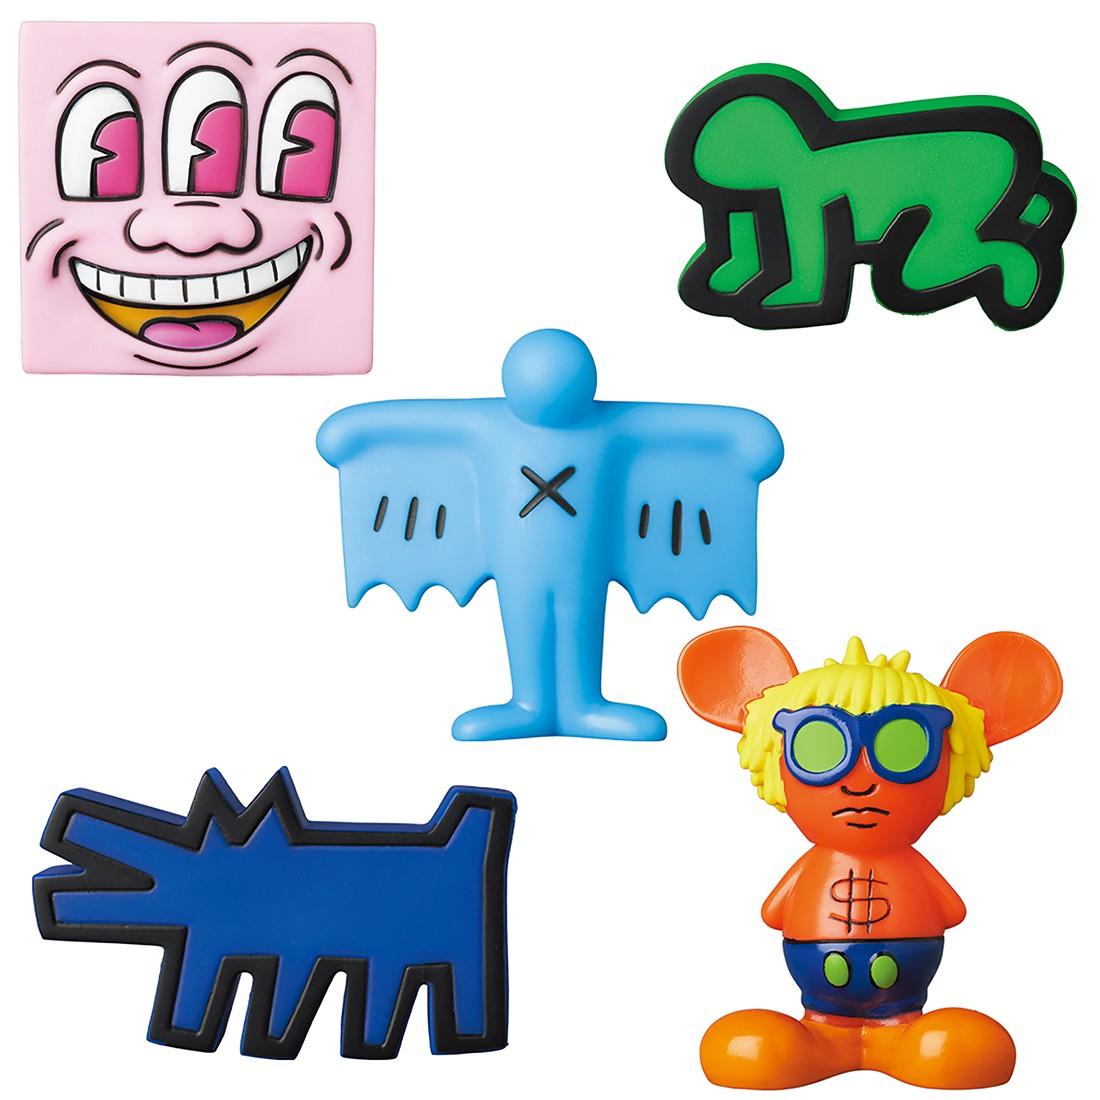 Medicom Mini VCD Keith Haring #2 Figure - 1 Blind Box